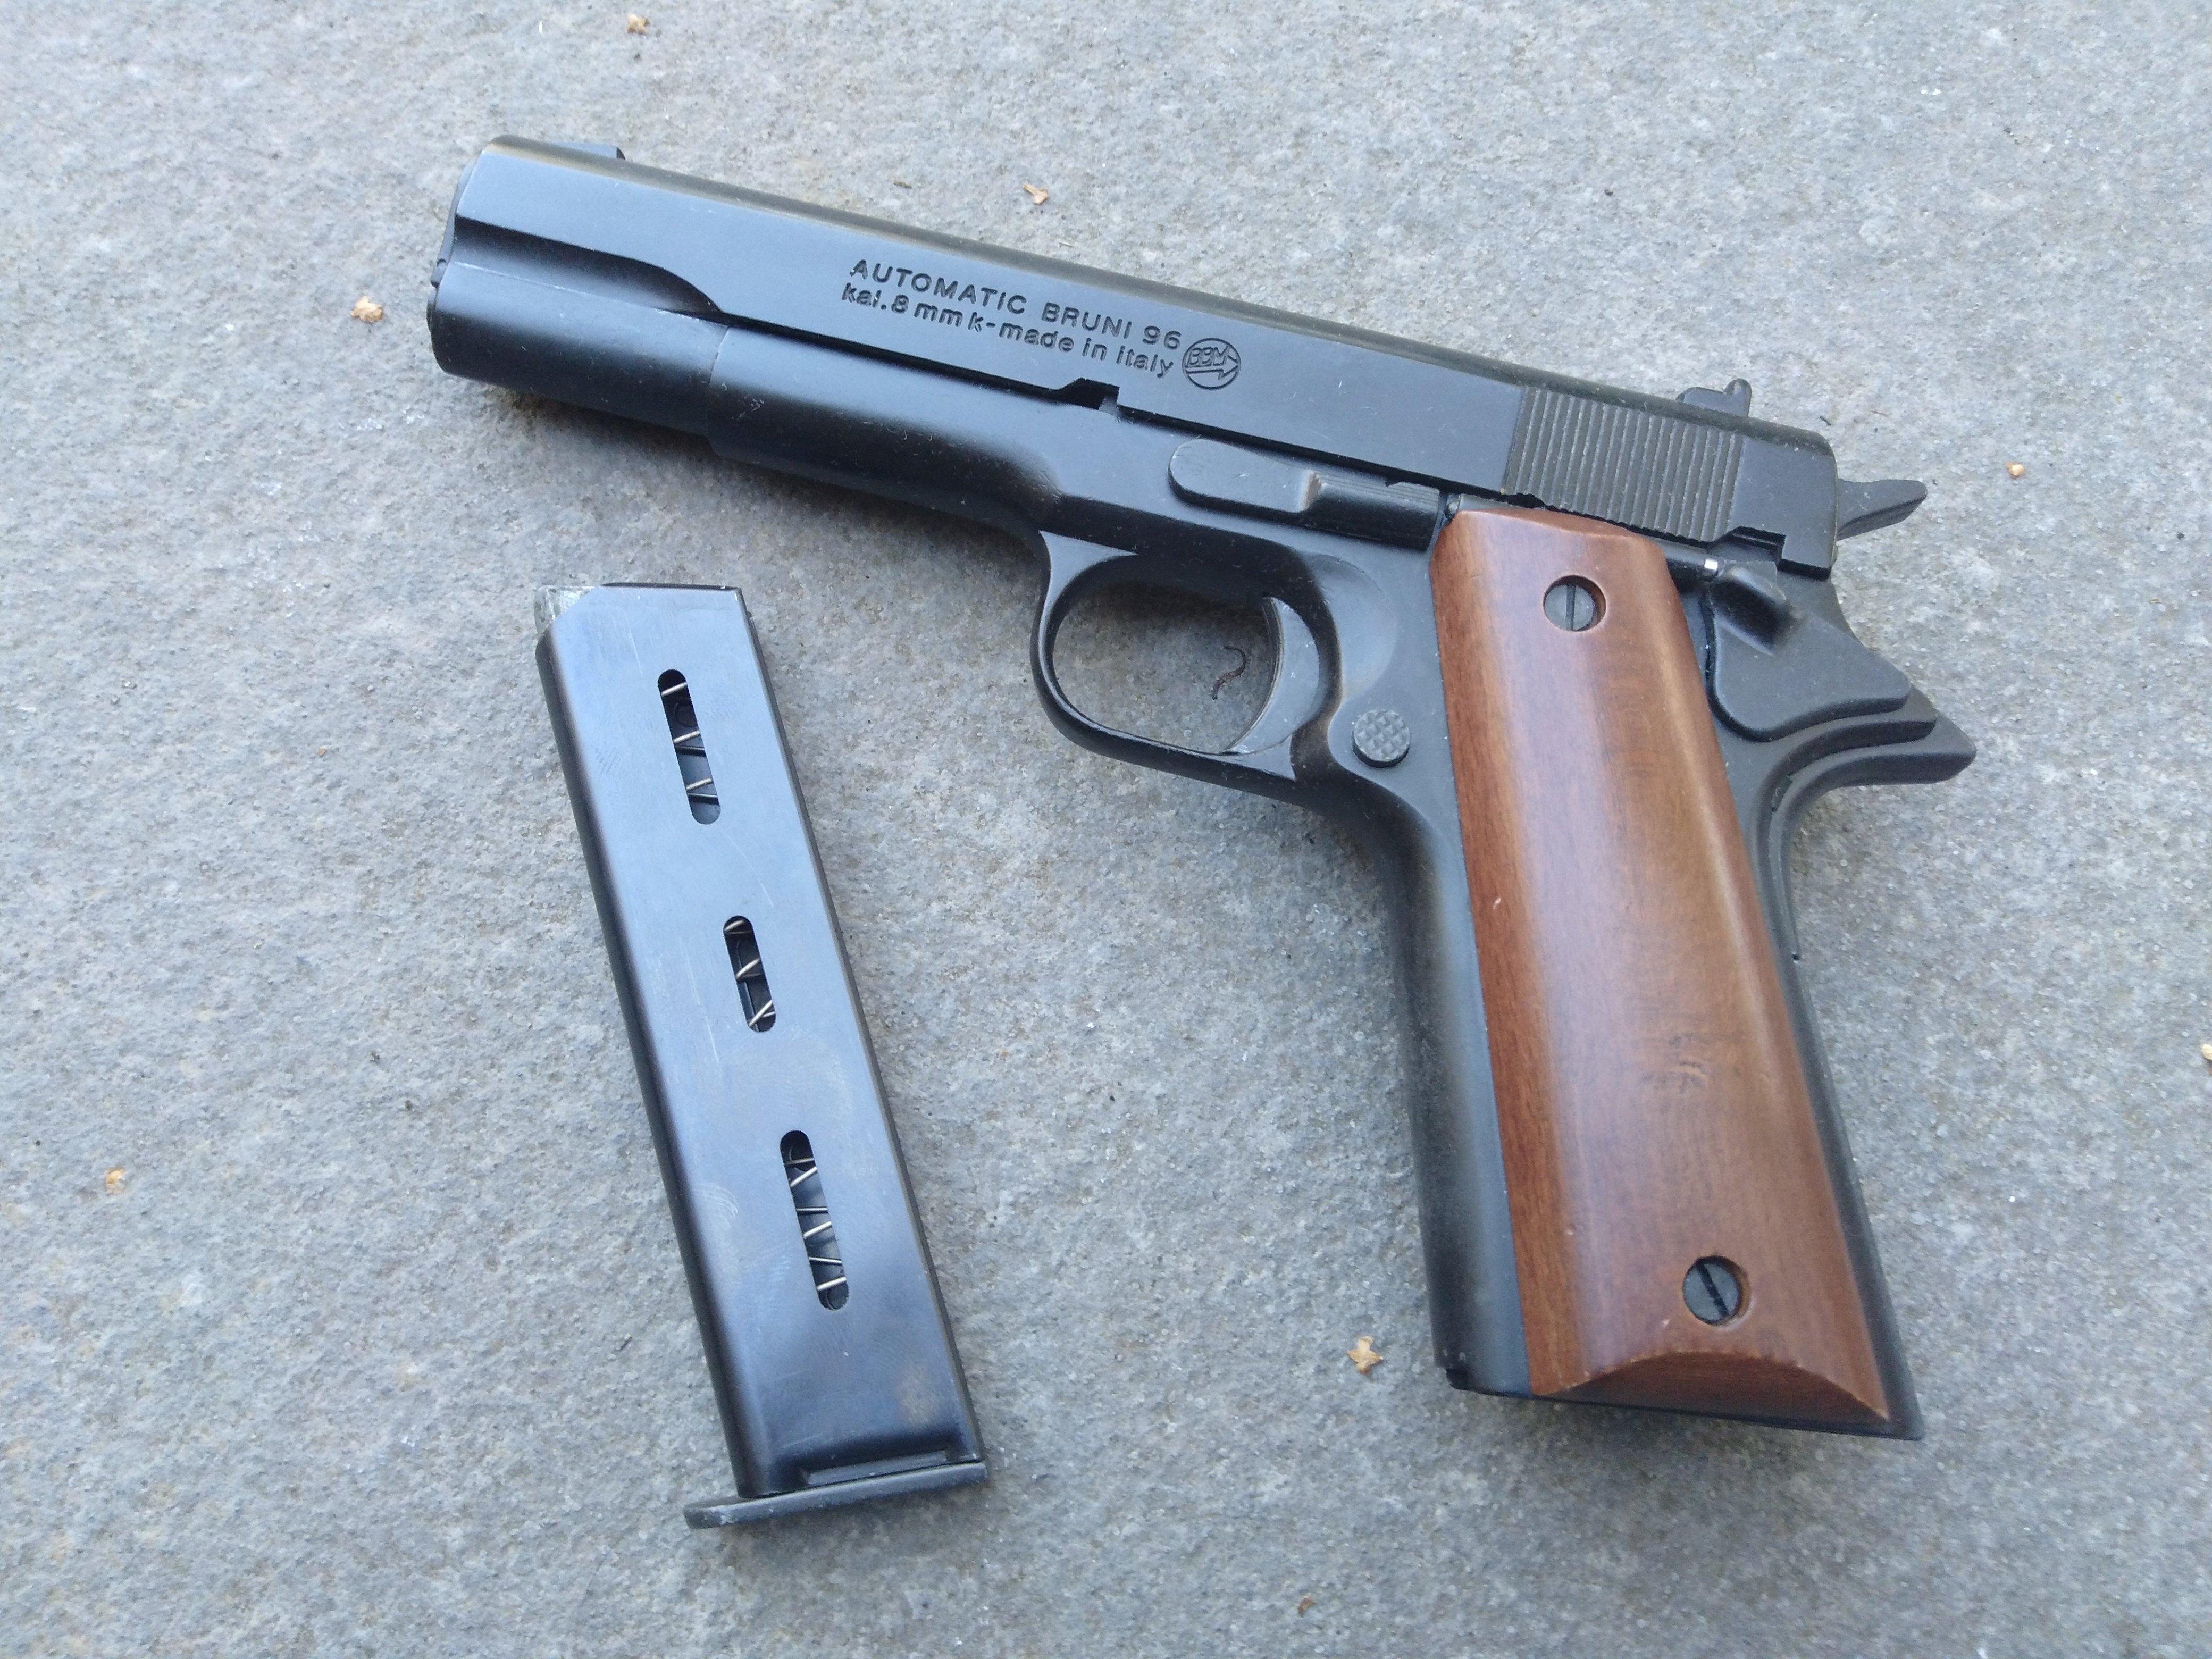 Pre-owned Bruni 96 Colt 1911